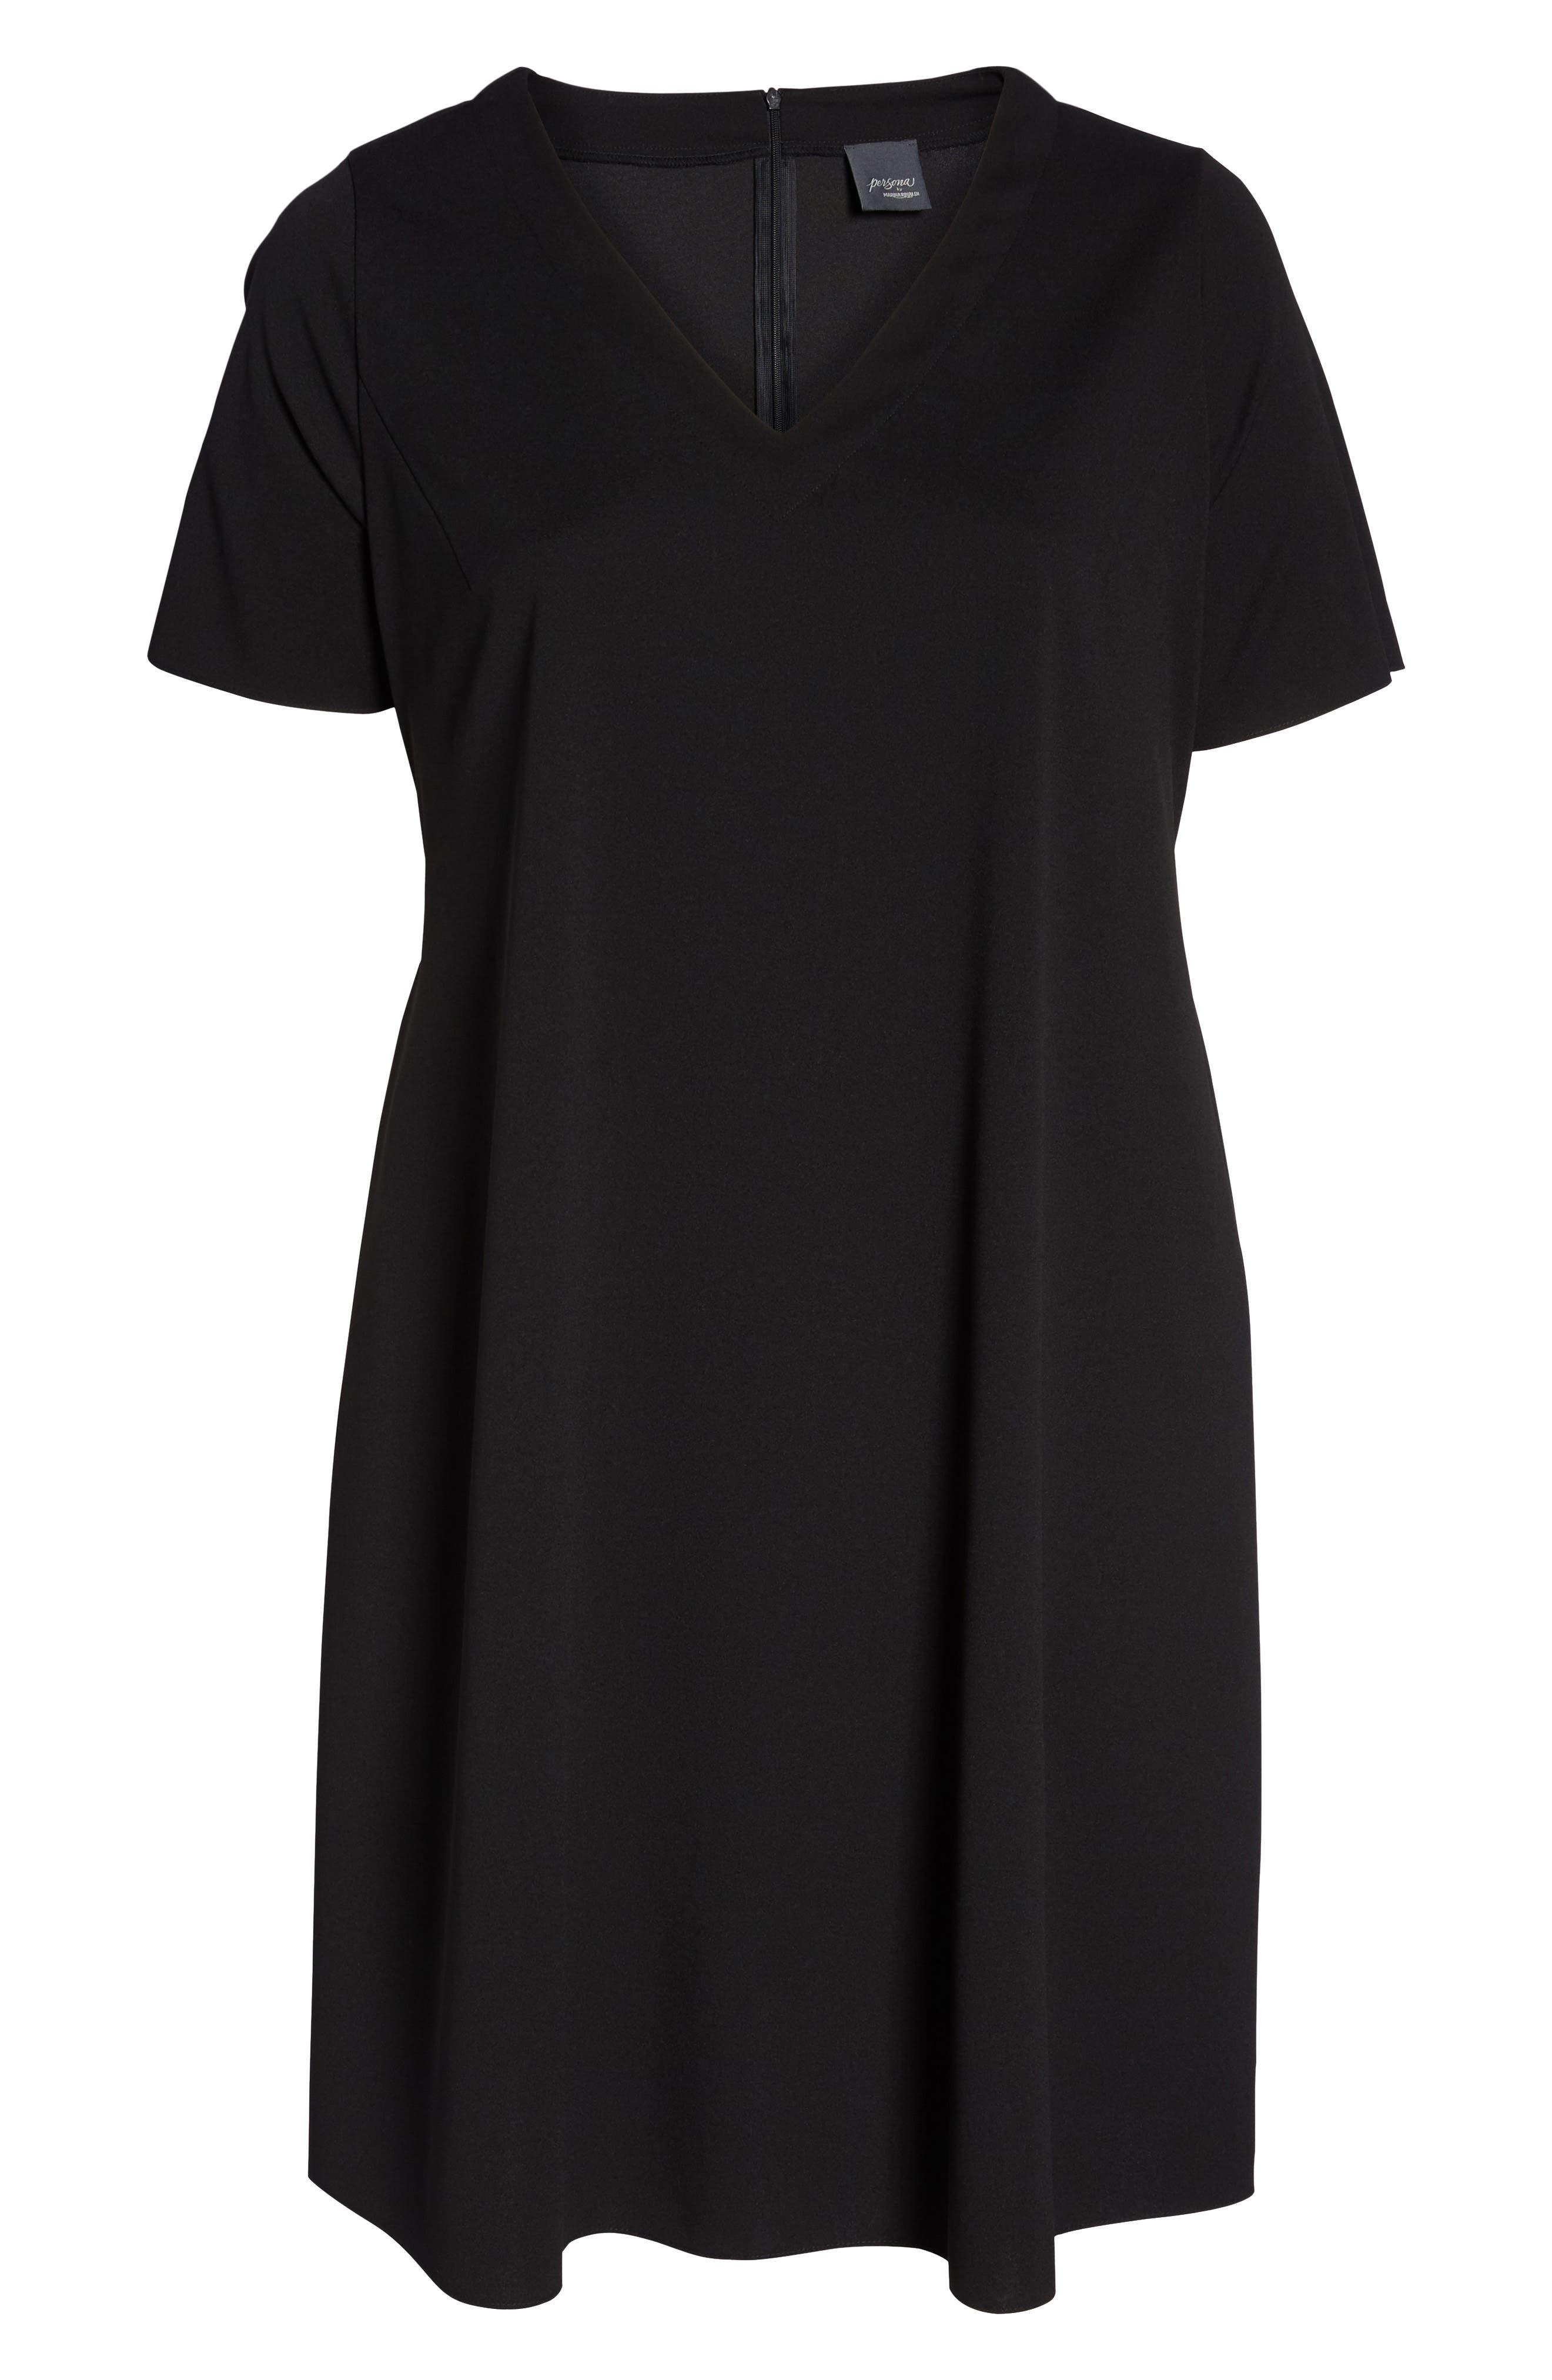 Short Sleeve Knit Dress,                             Alternate thumbnail 6, color,                             Black